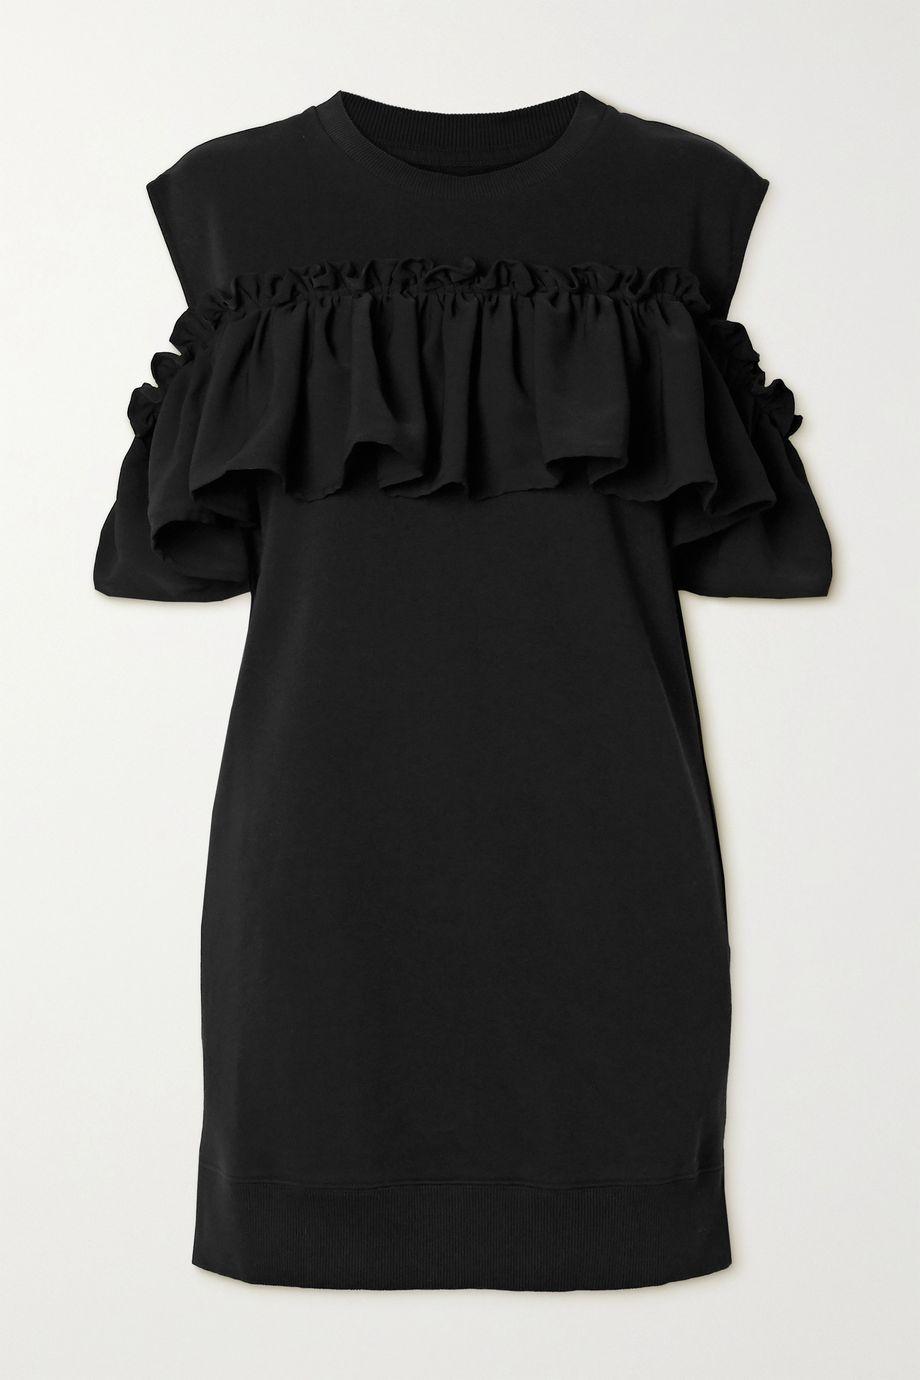 MM6 Maison Margiela Cold-shoulder ruffled cotton-blend jersey dress